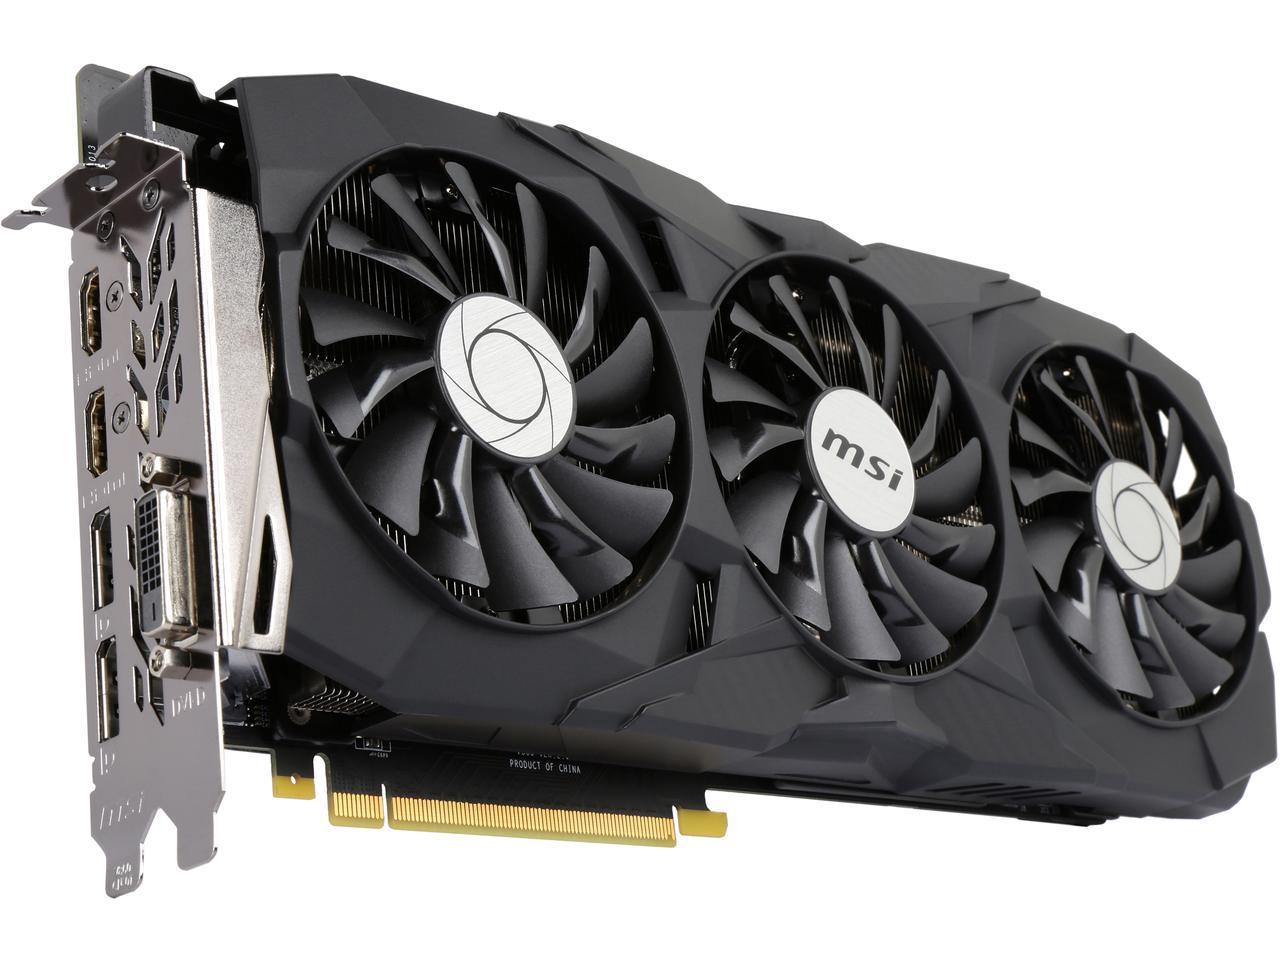 MSI GeForce GTX 1080 Ti Duke $689.99